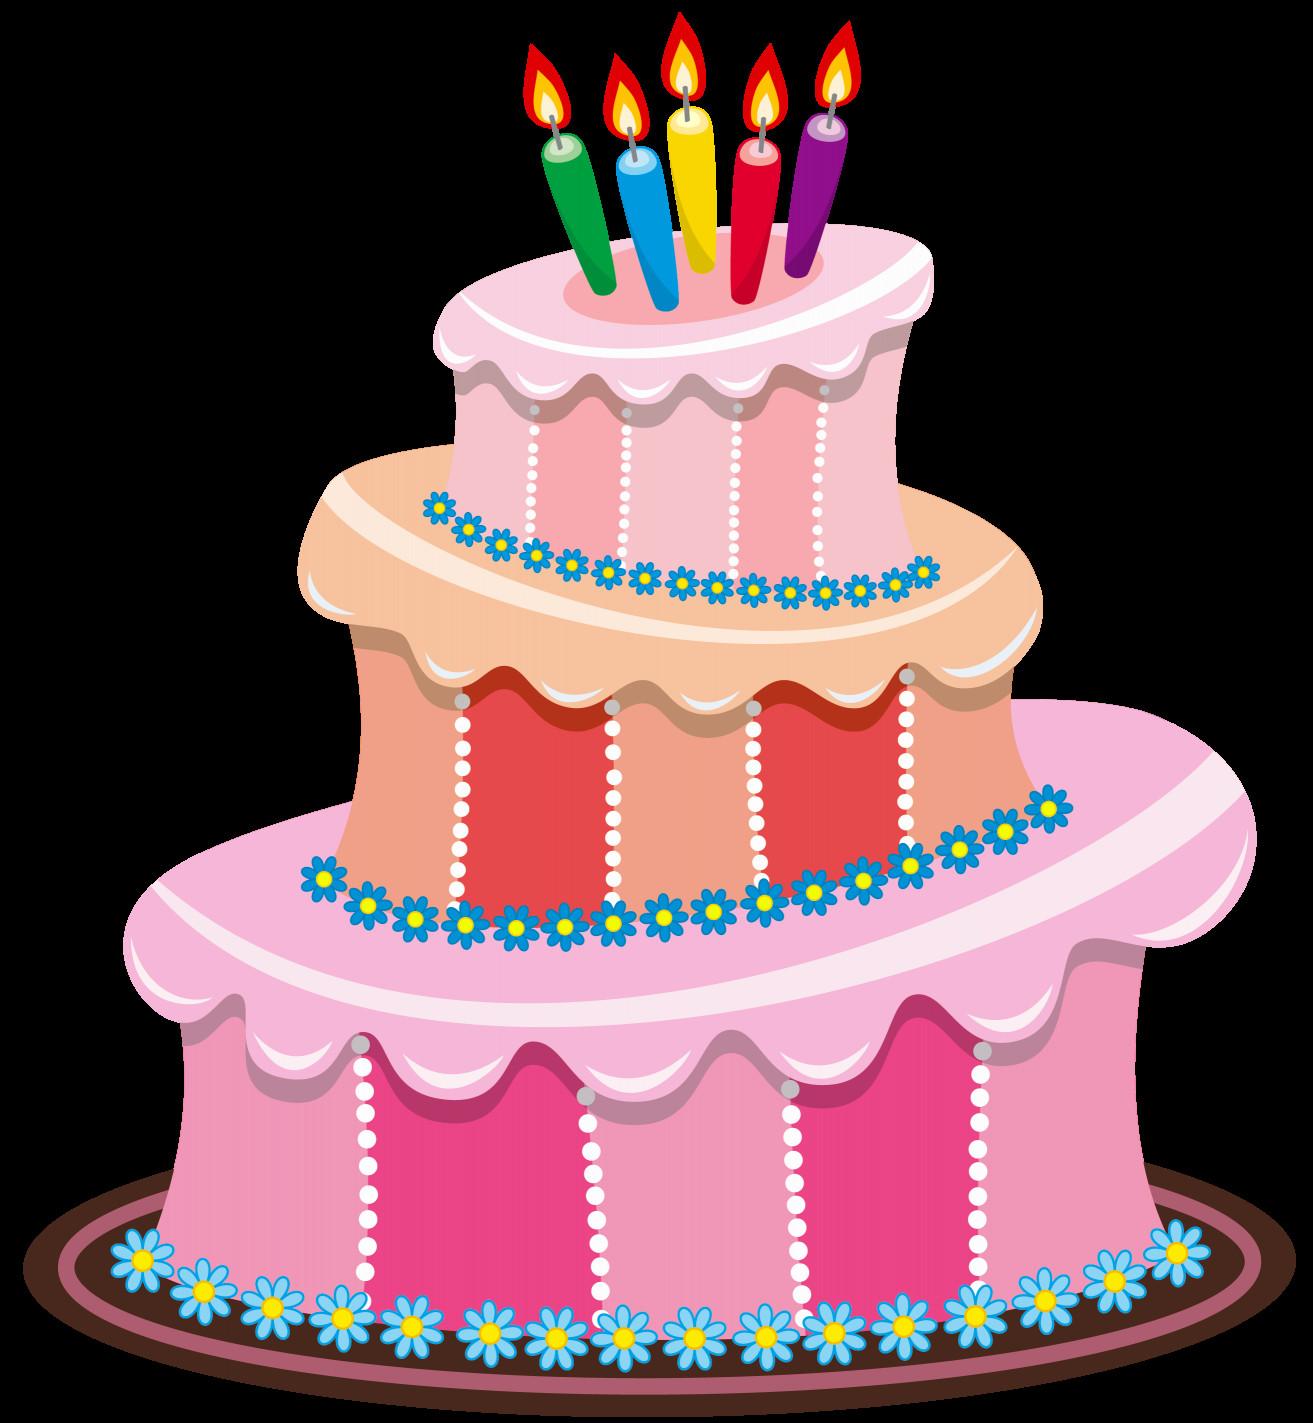 Animated Birthday Cake  Birthday Cake Clip Art Free Download Clip Art